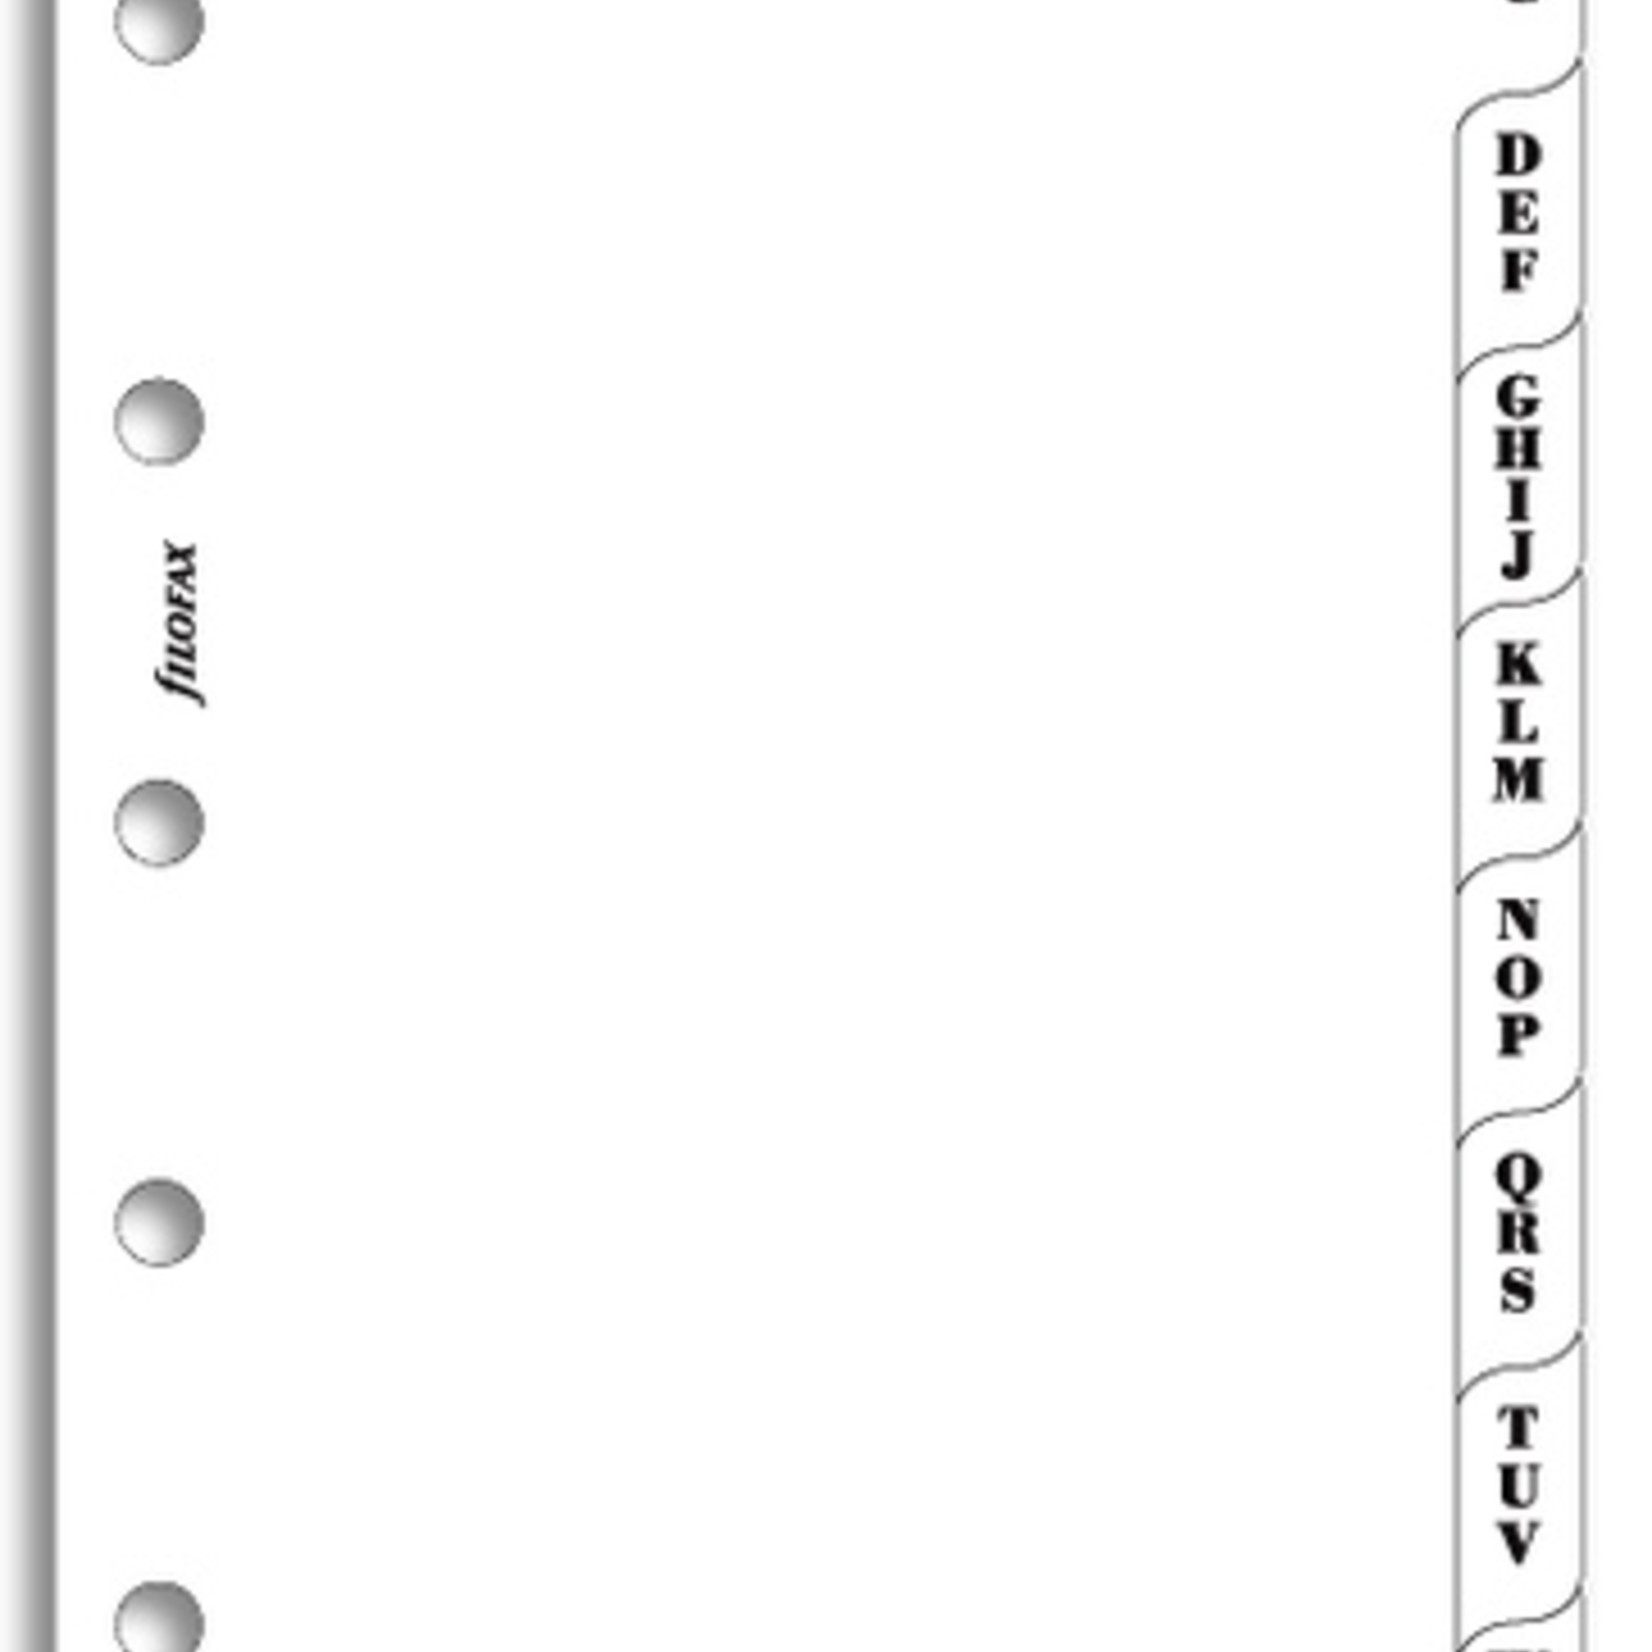 Filofax Filofax Einlage Mini, Register A-Z, 3 Buchst., weiß